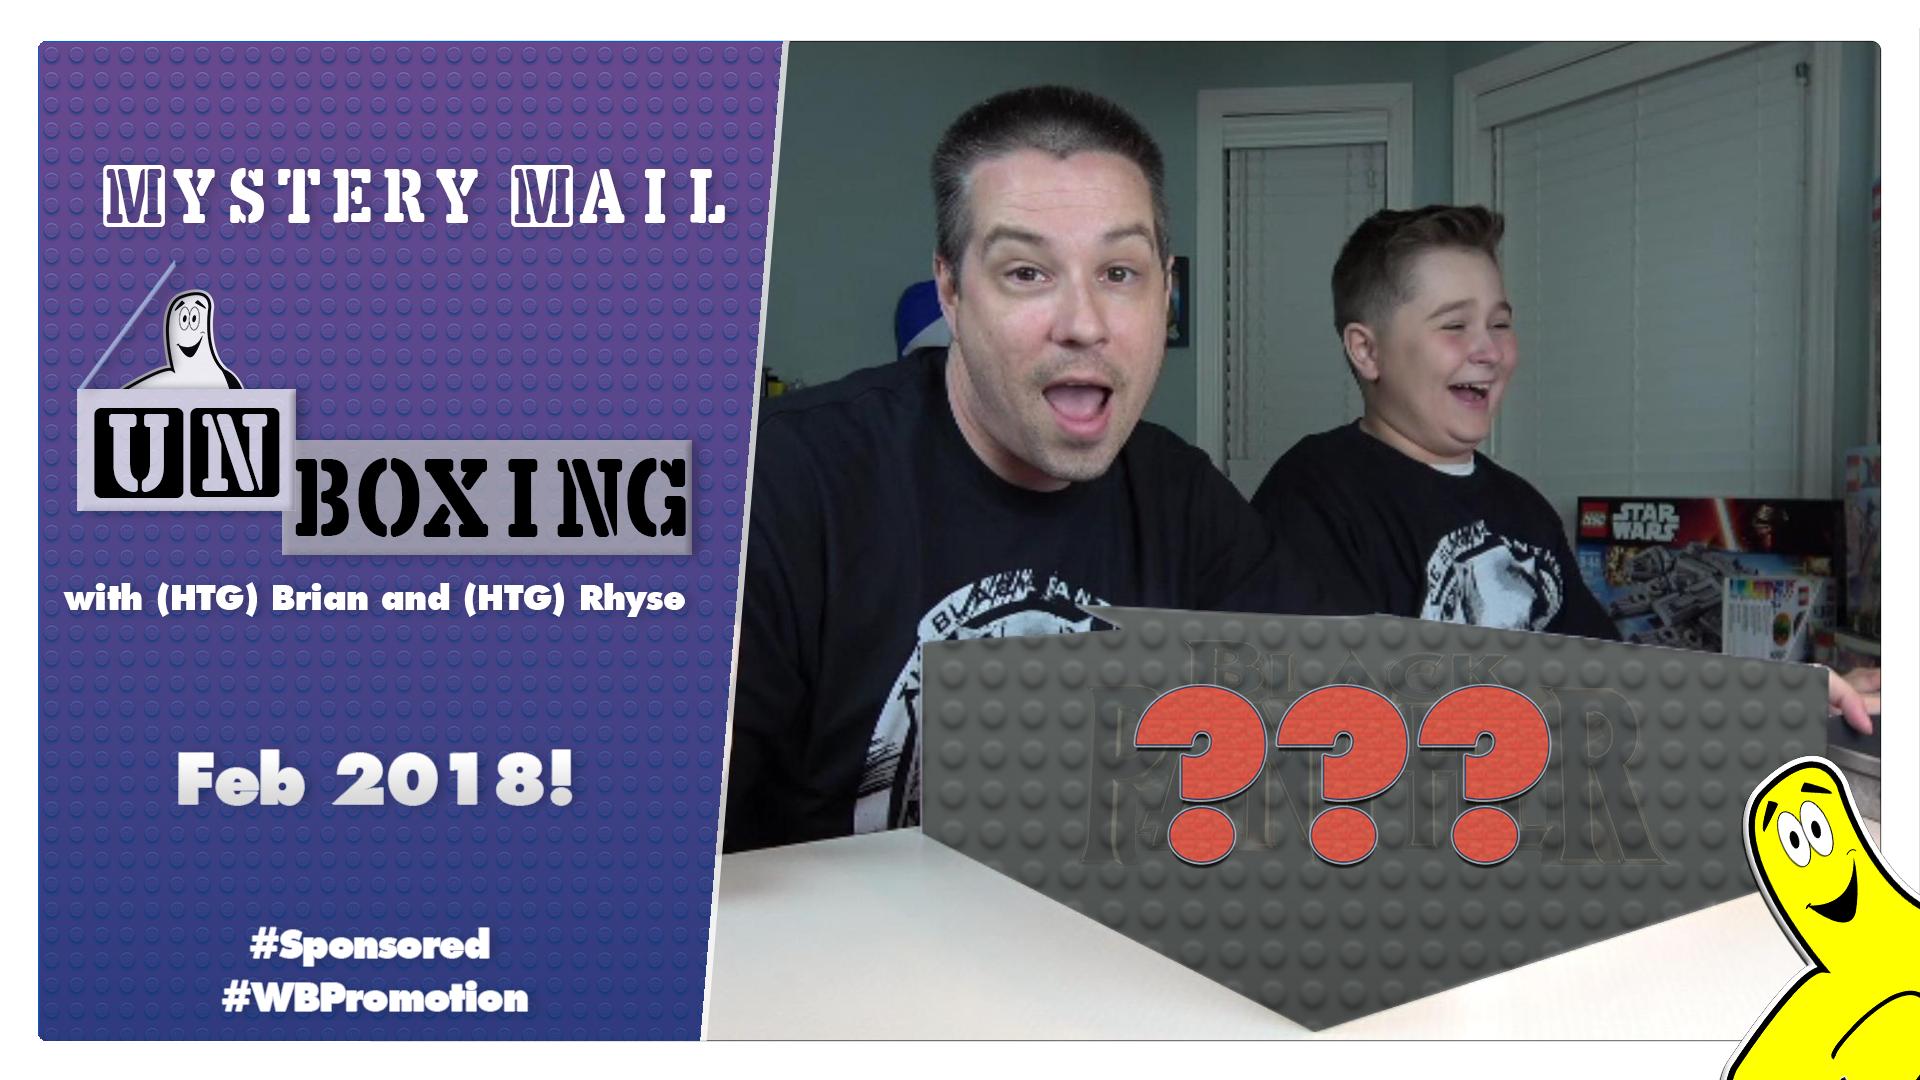 MysteryMailUnboxingLegoMarvel2BlackPantherFunMailer